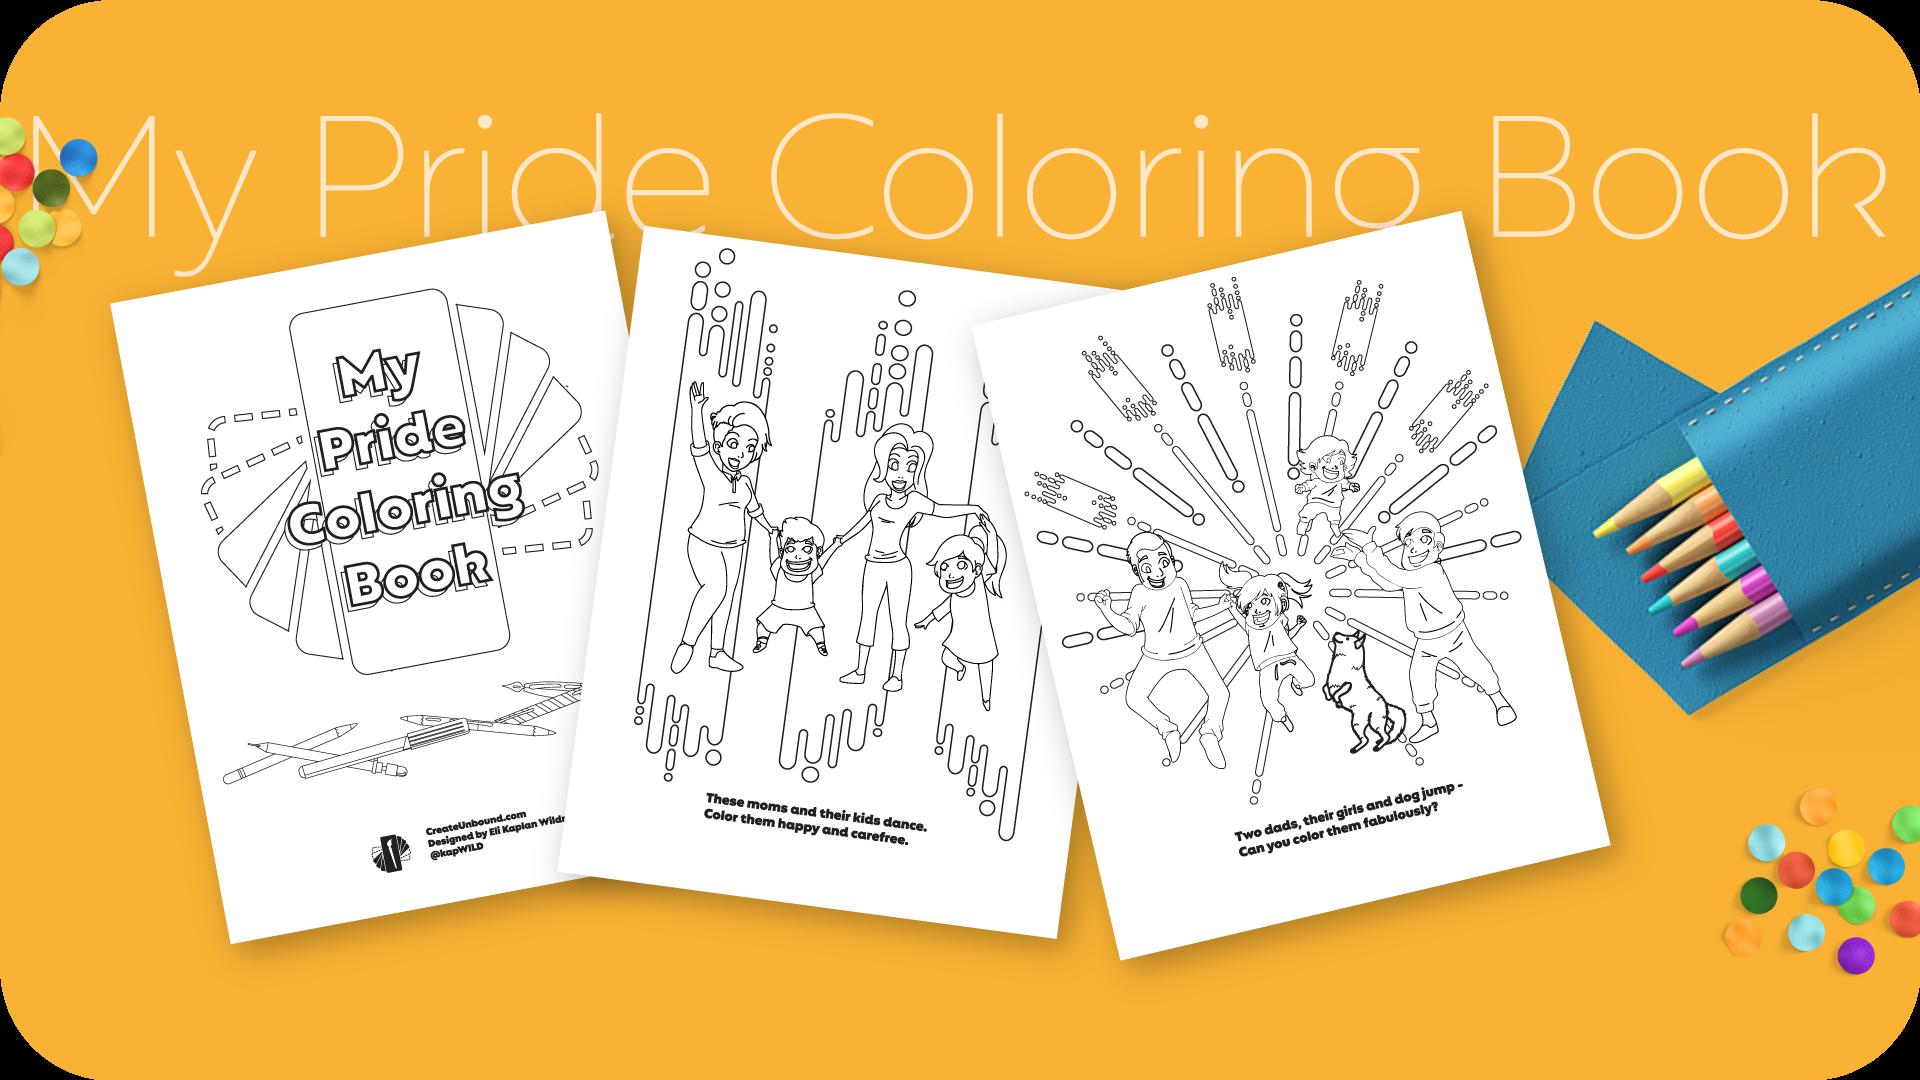 My Pride Coloring Book